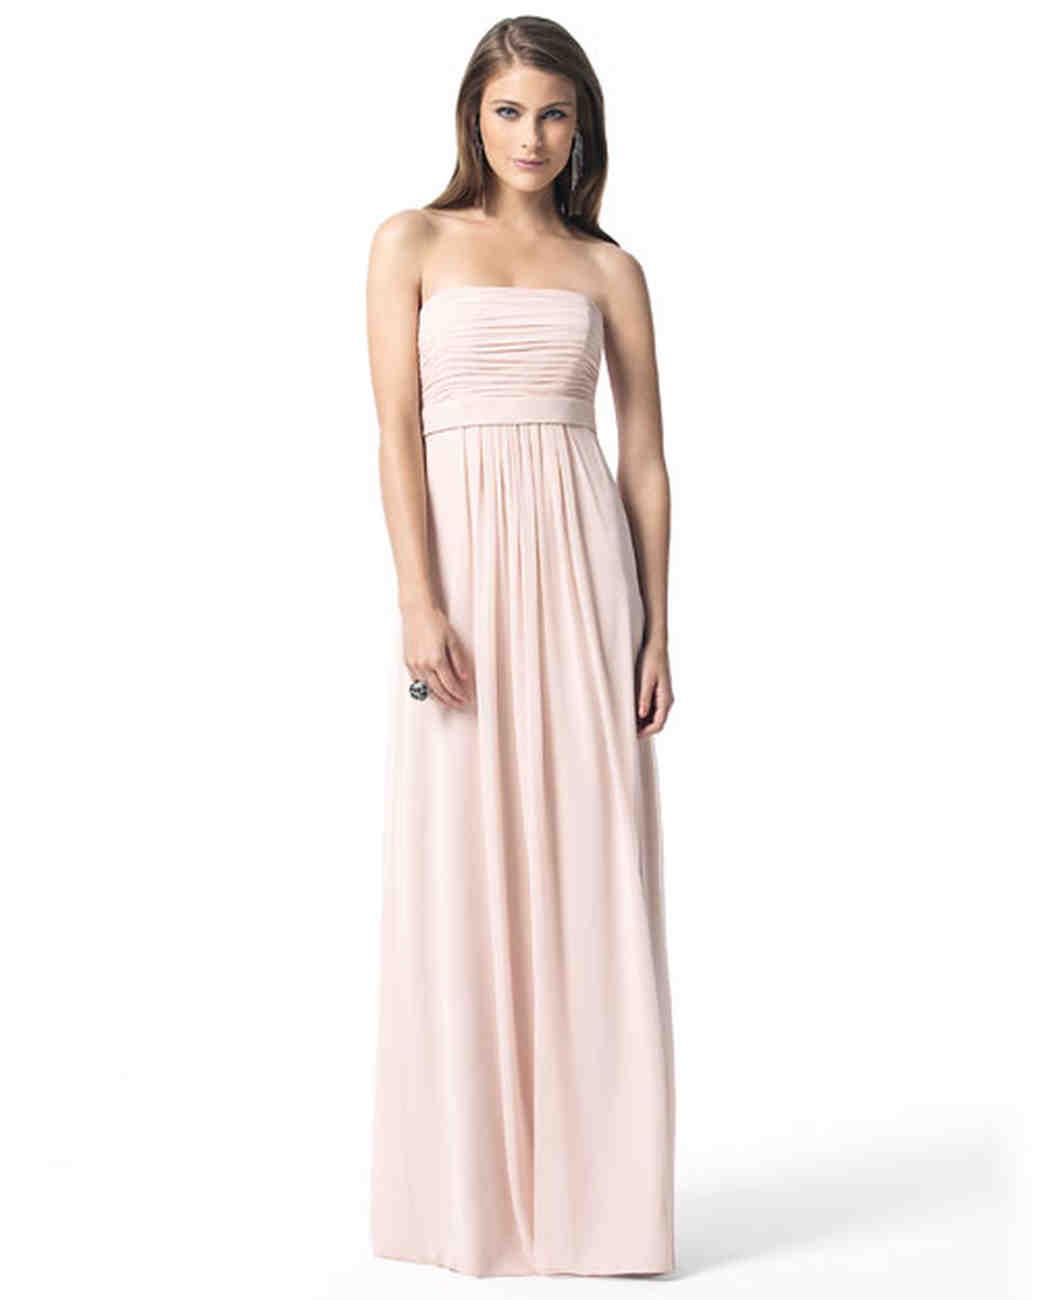 Bridesmaid dresses for beach weddings martha stewart weddings ombrellifo Gallery